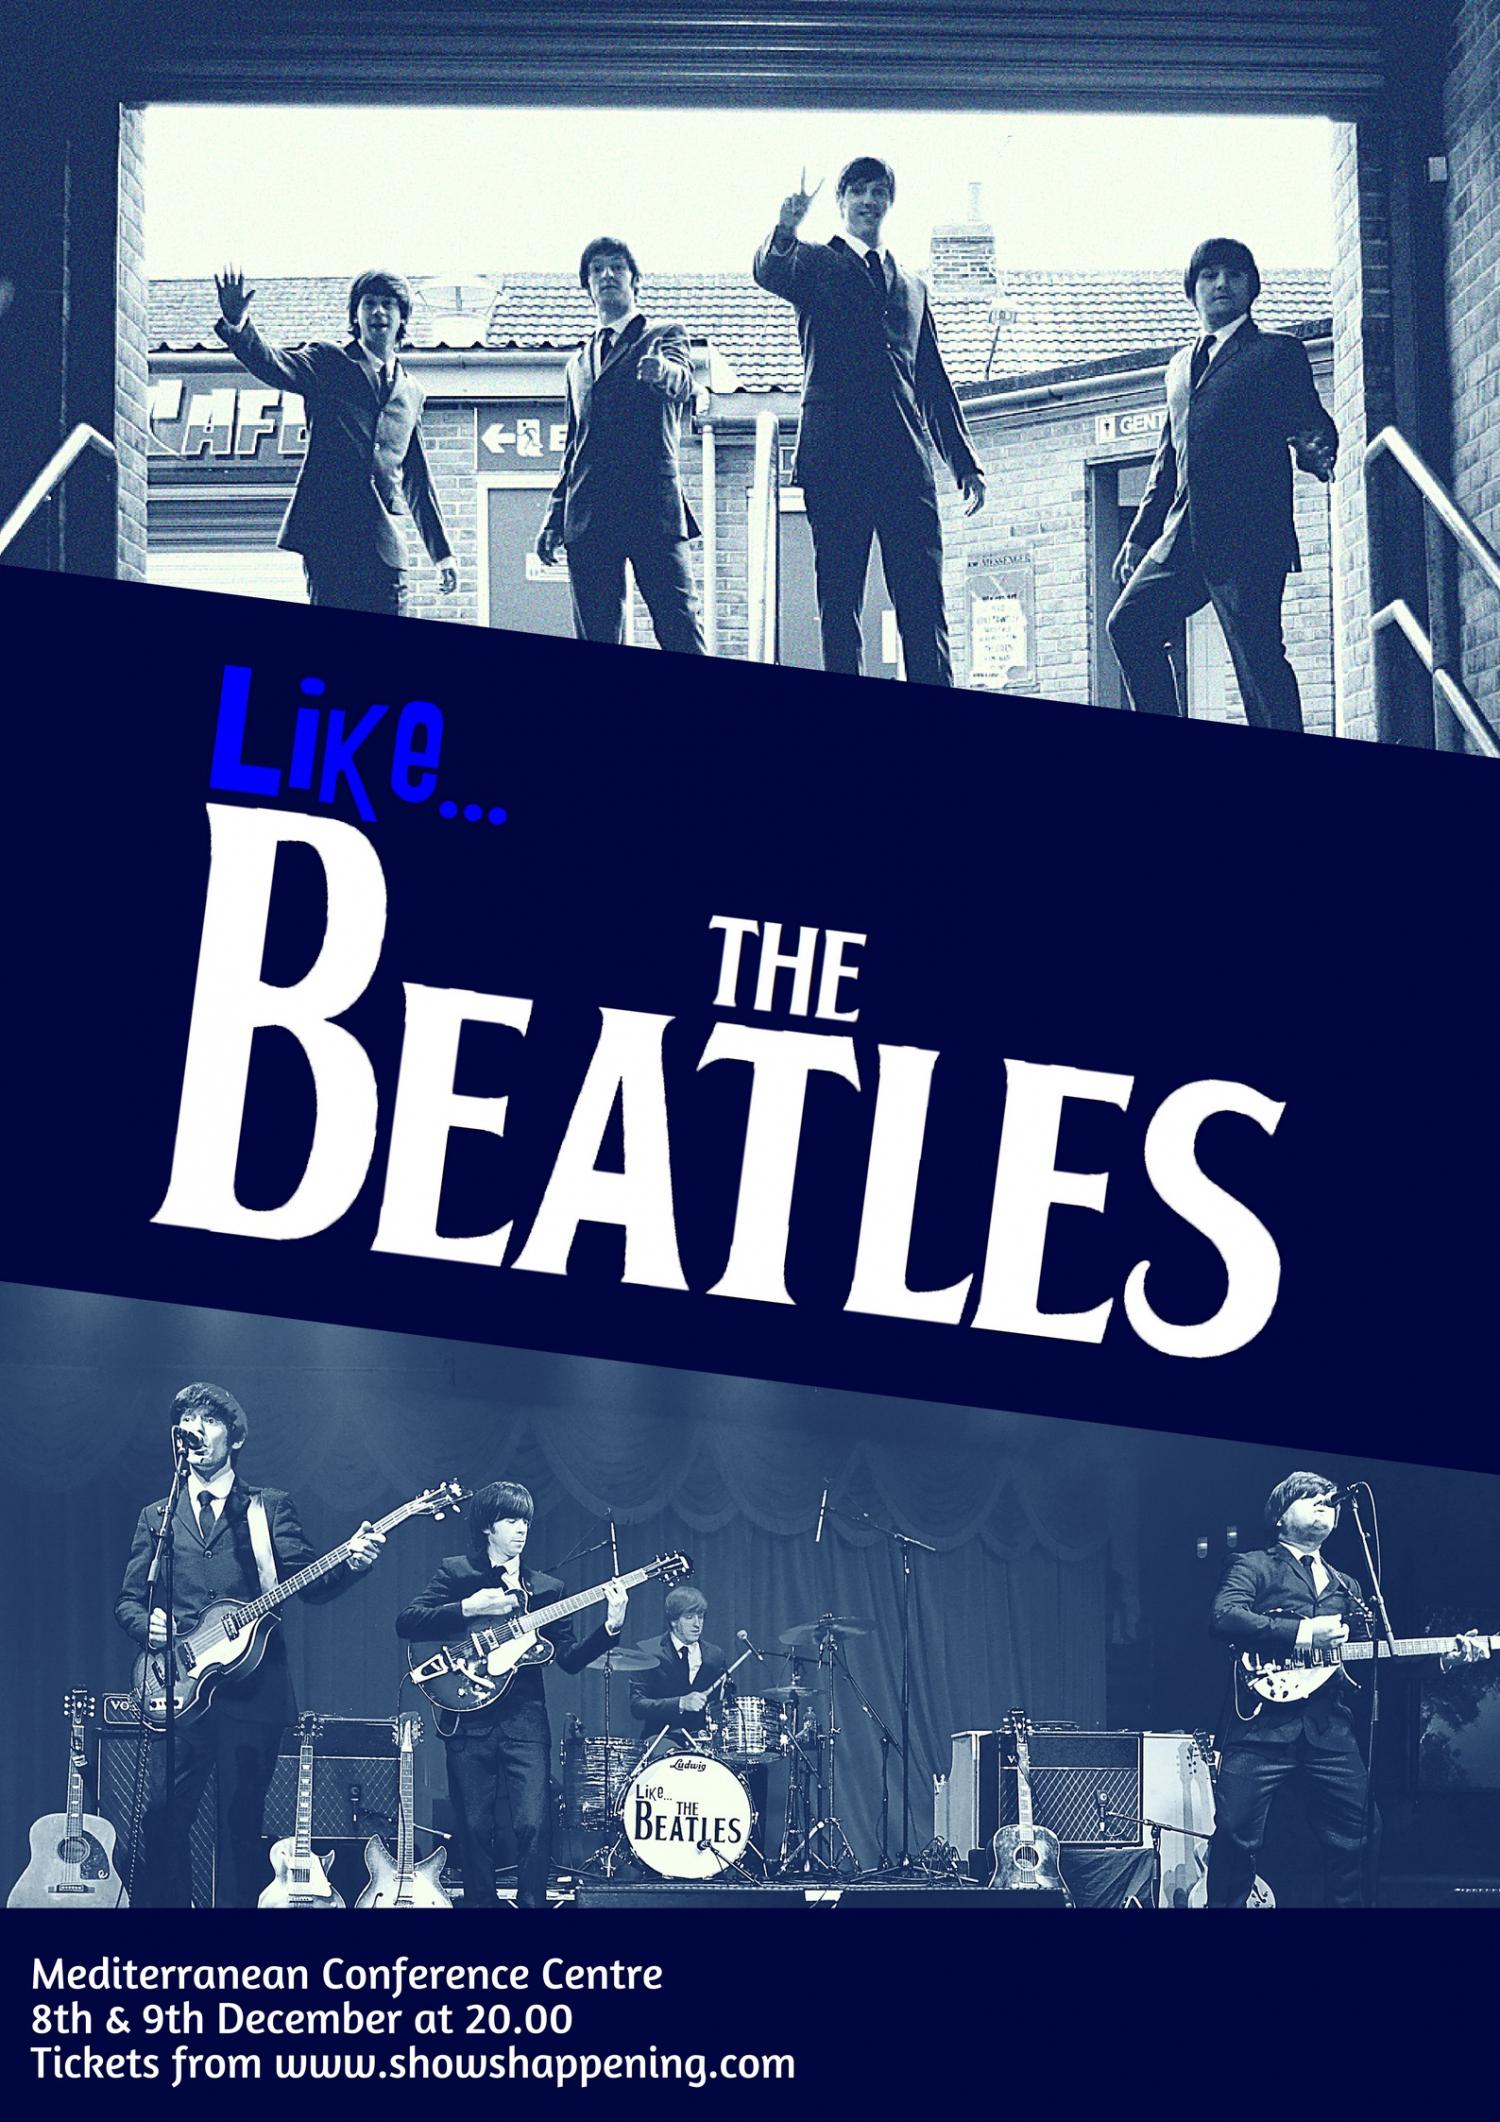 Like...The Beatles